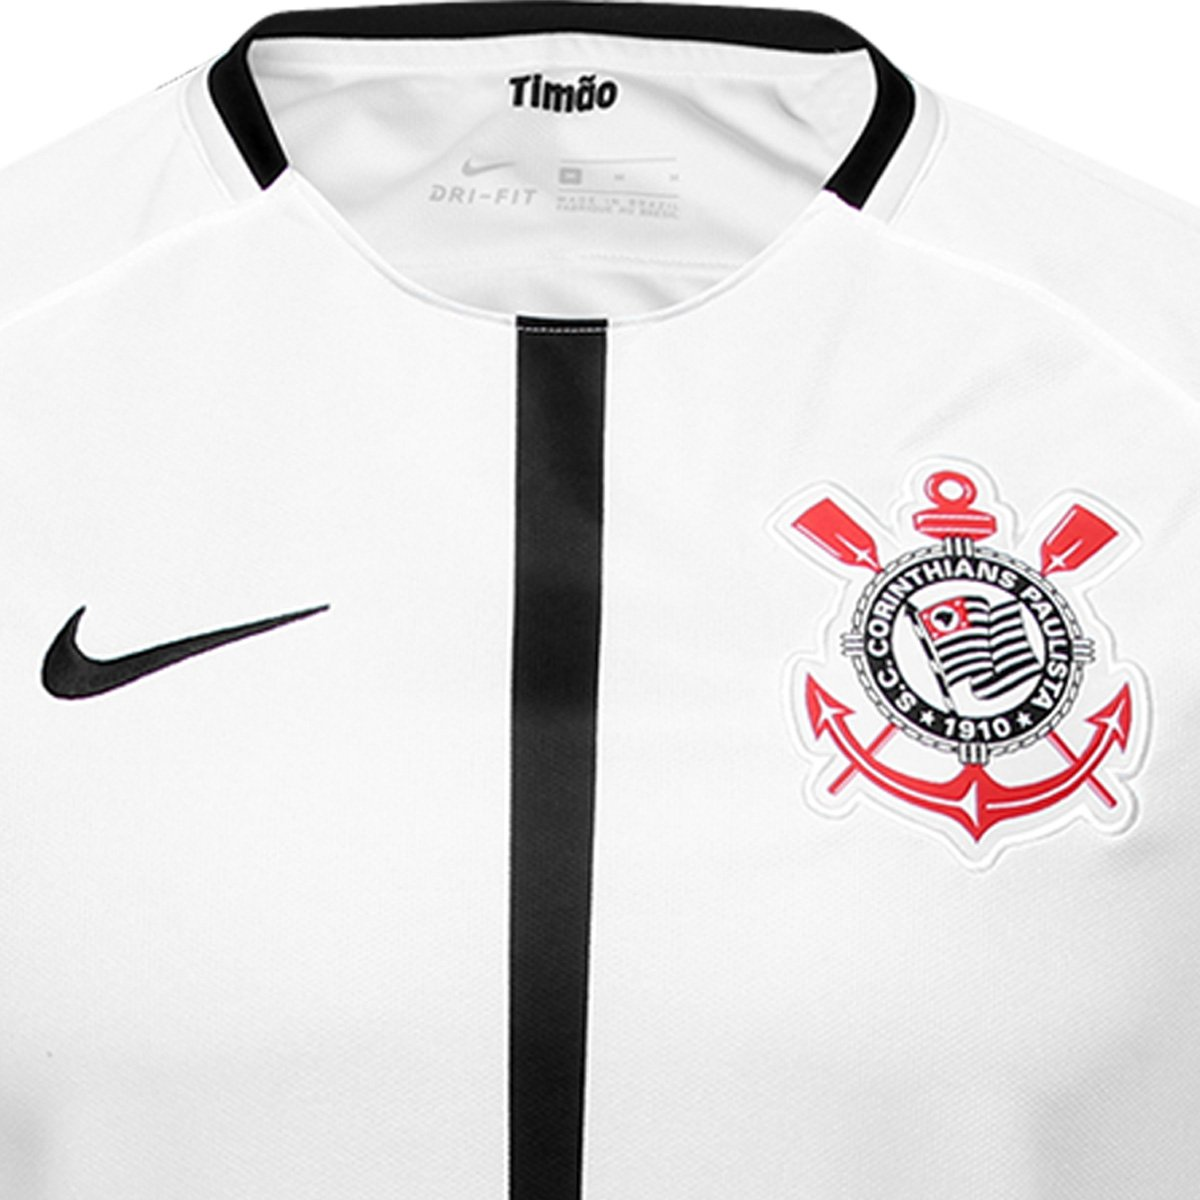 101a138ab8 Camisa Corinthians I 17 18 s nº Torcedor Nike Masculina - Compre ...